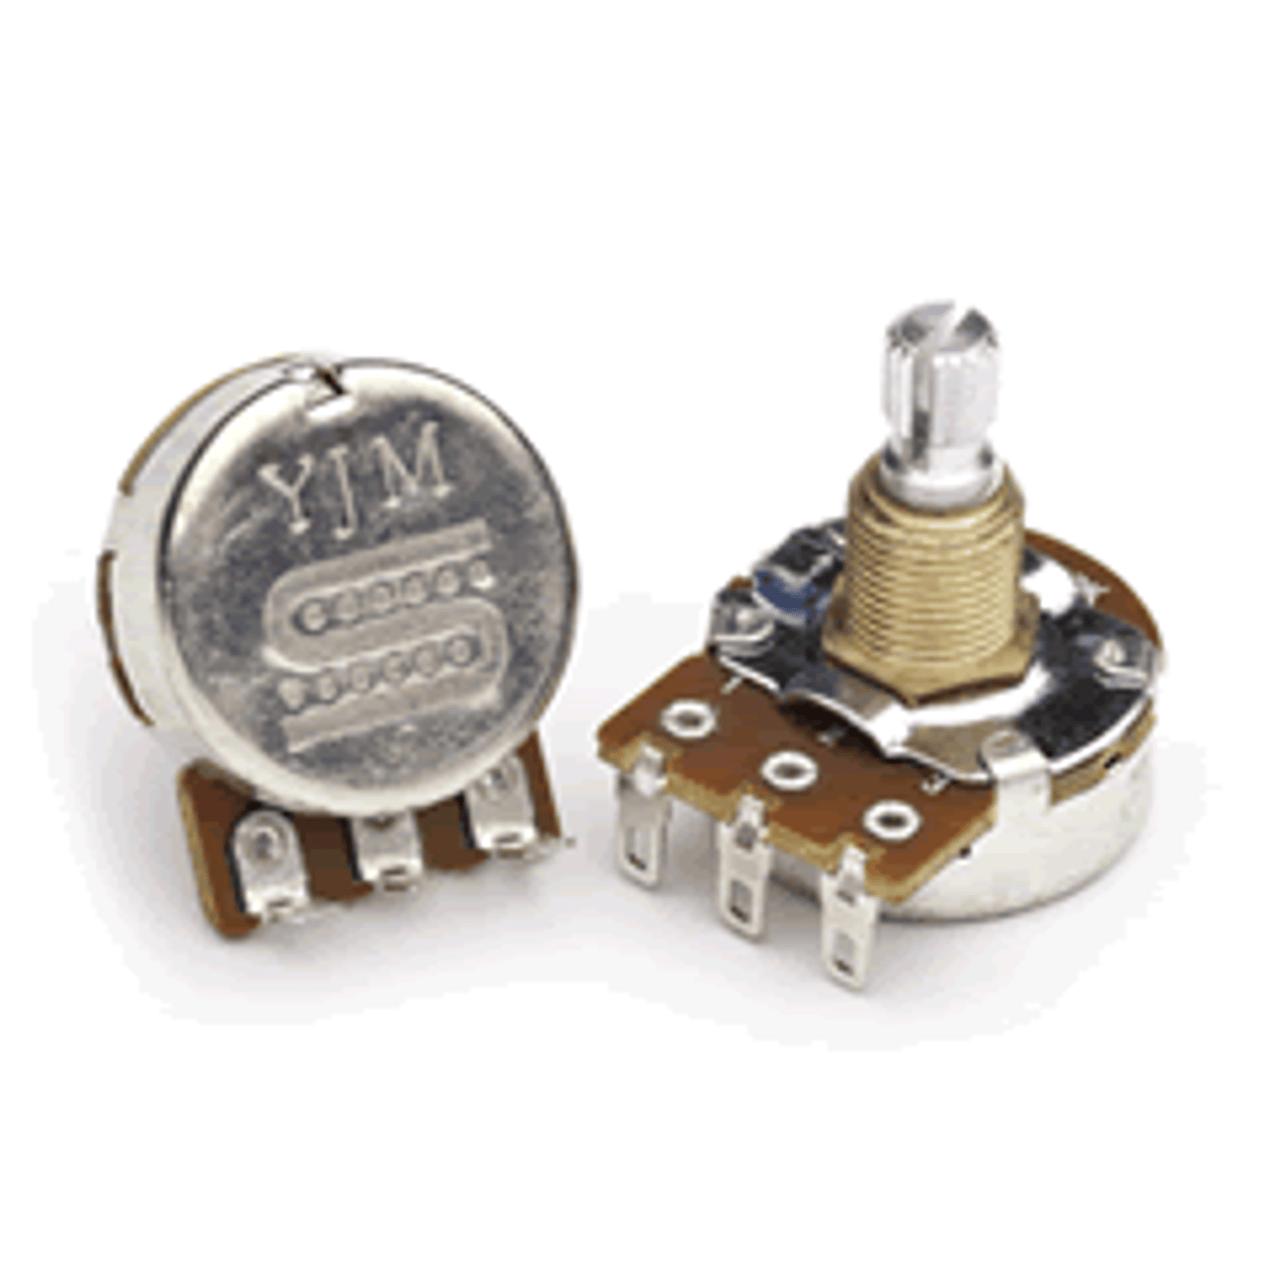 Electronics and Pickup Hardware